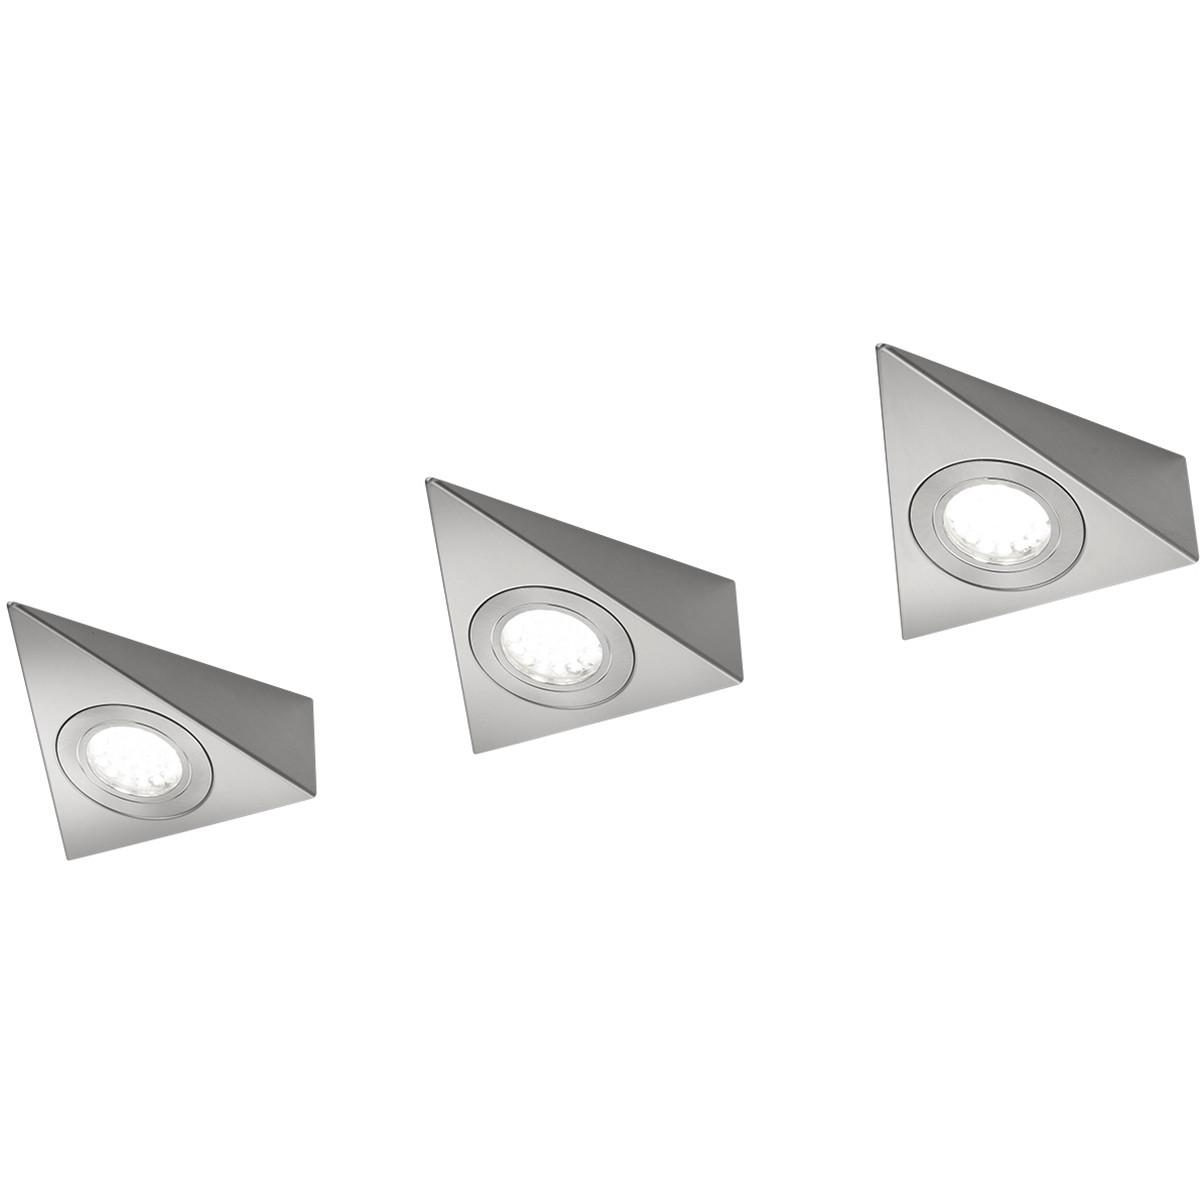 LED Keukenkast Verlichting - Trion Ecoli - 9W - 3-lichts - Warm Wit 3000K - Driehoek - Mat Nikkel -